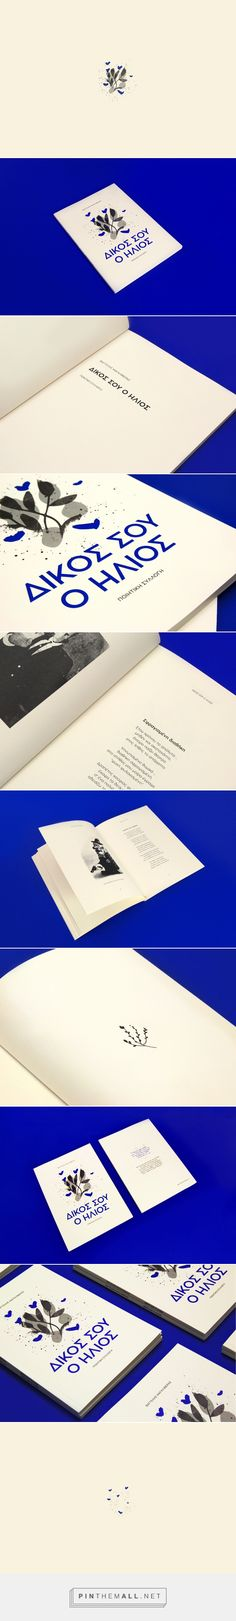 Book Design on Behance - elialaourda.com